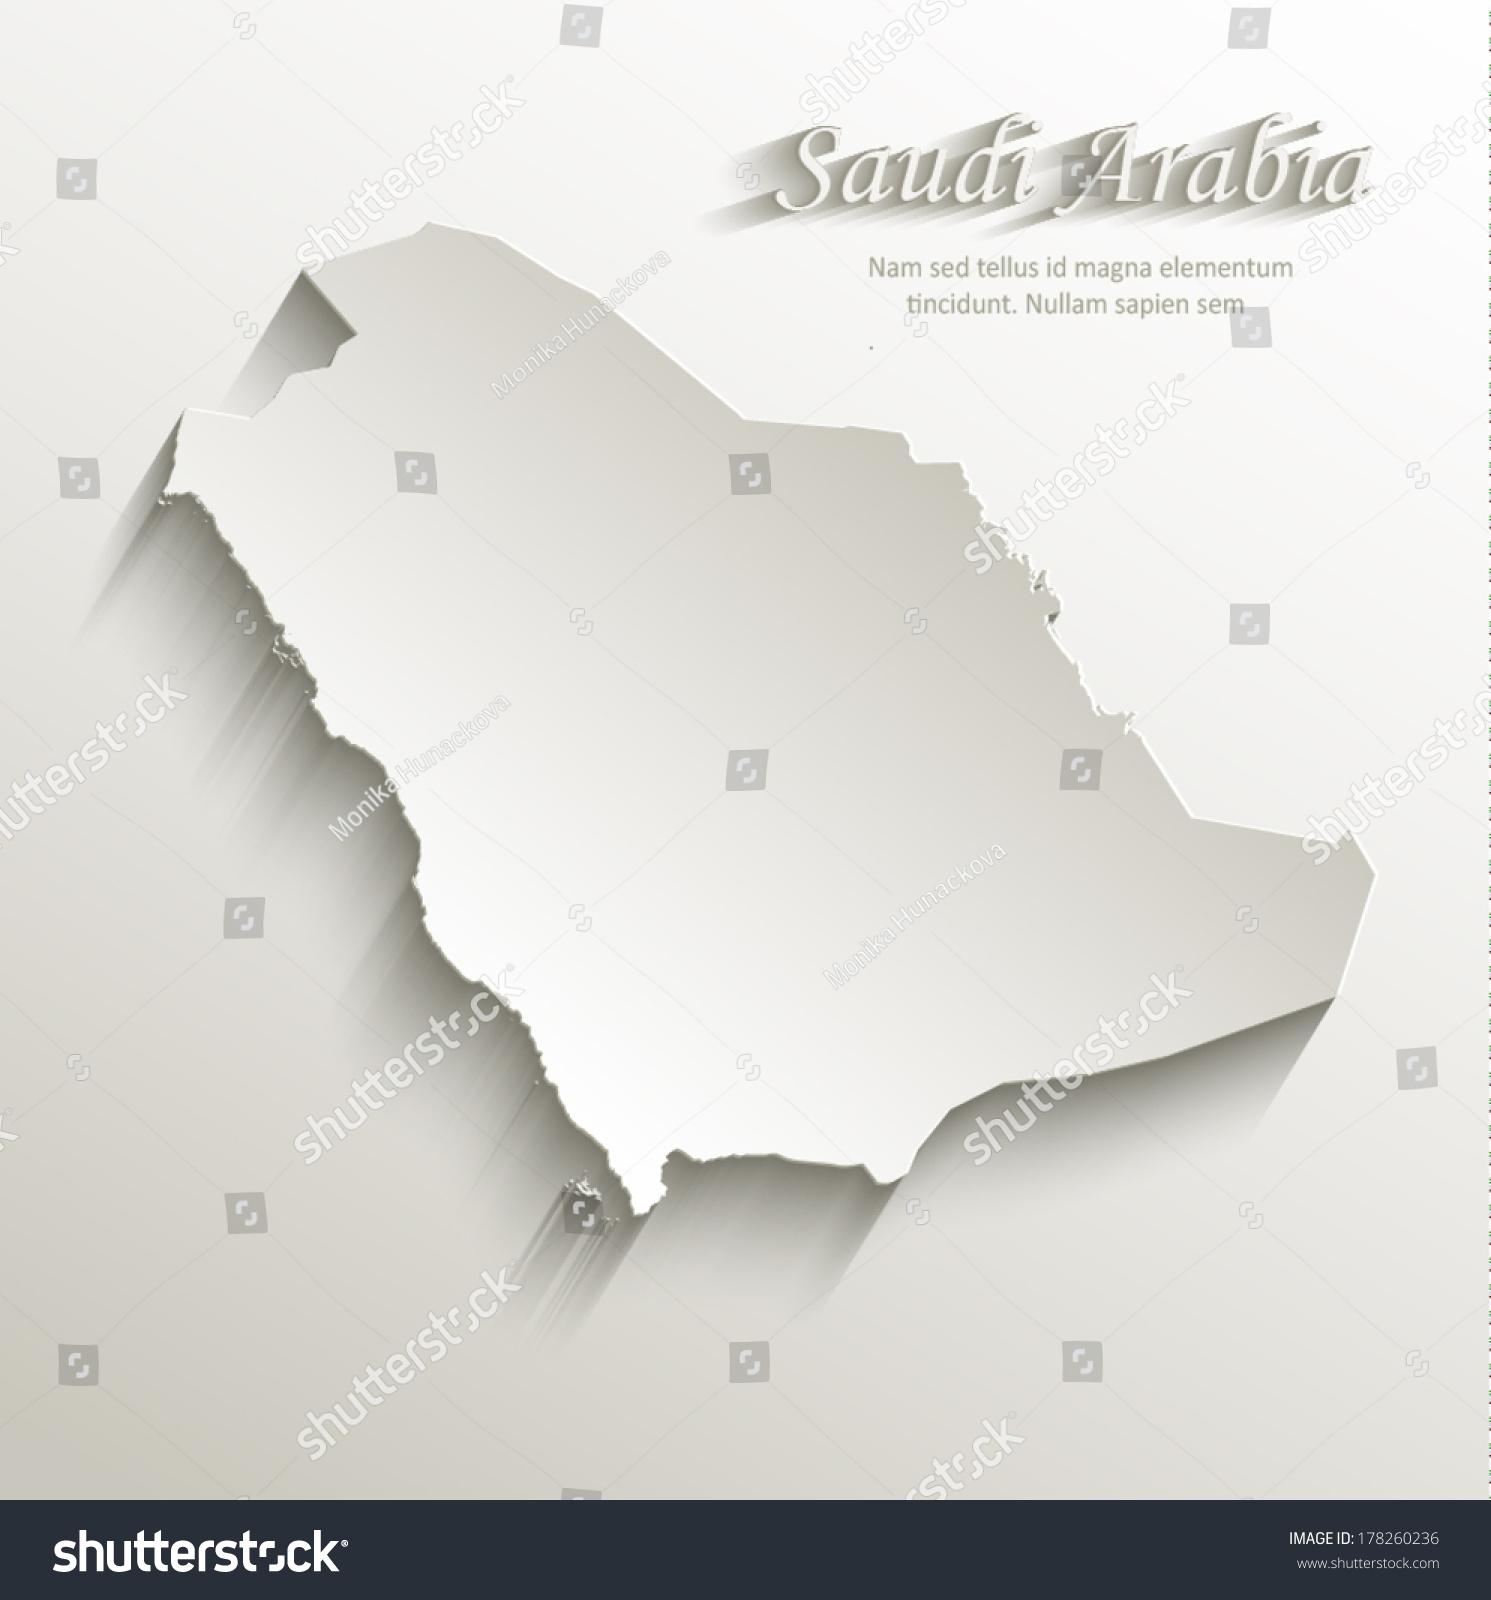 saudi english paper List of newspapers, news sites, radio, live tv channels and jobs updates of saudi arabia : asia.